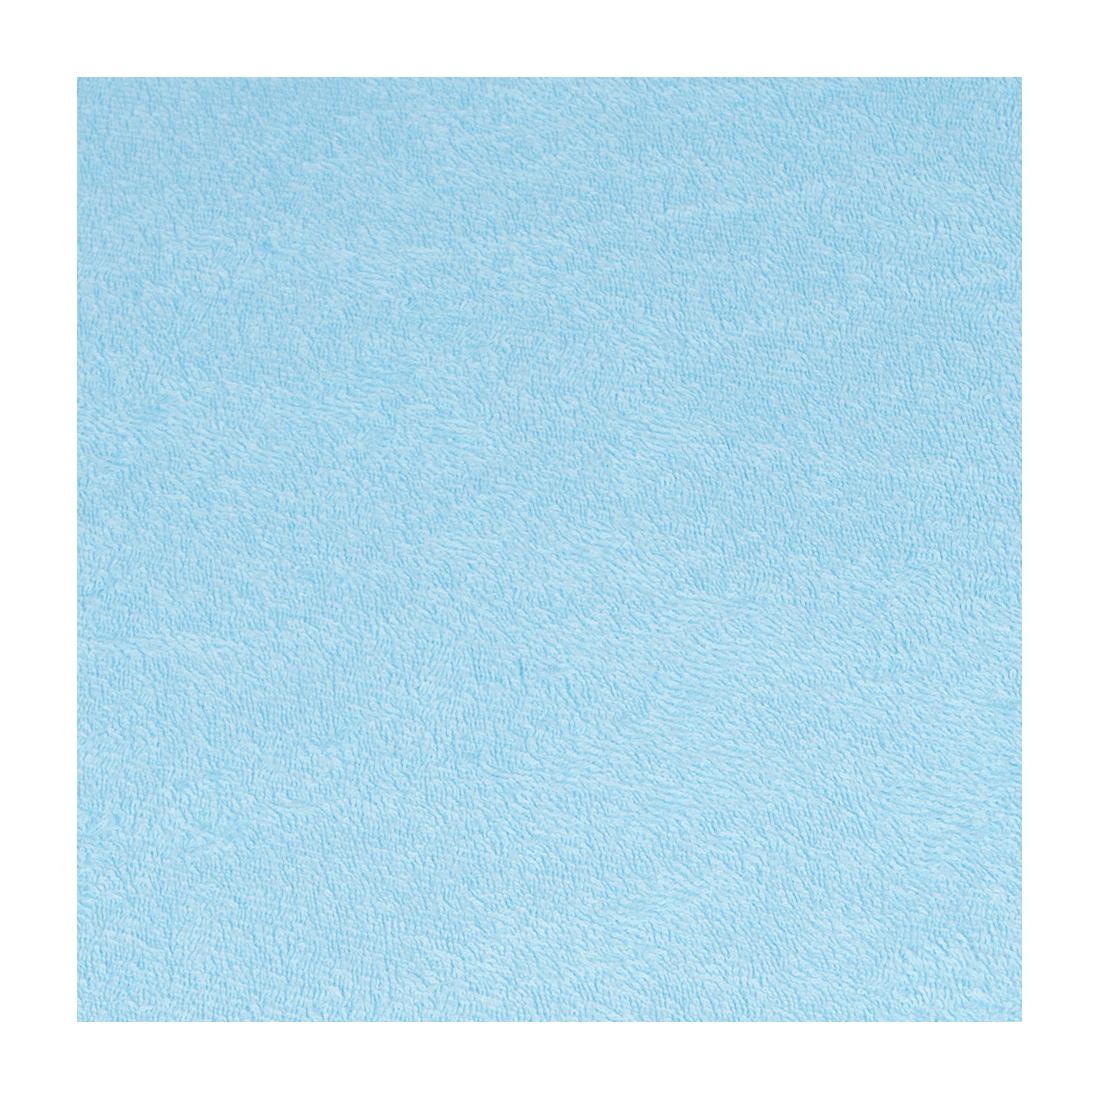 NP froté podkova 35x35 M, modrá